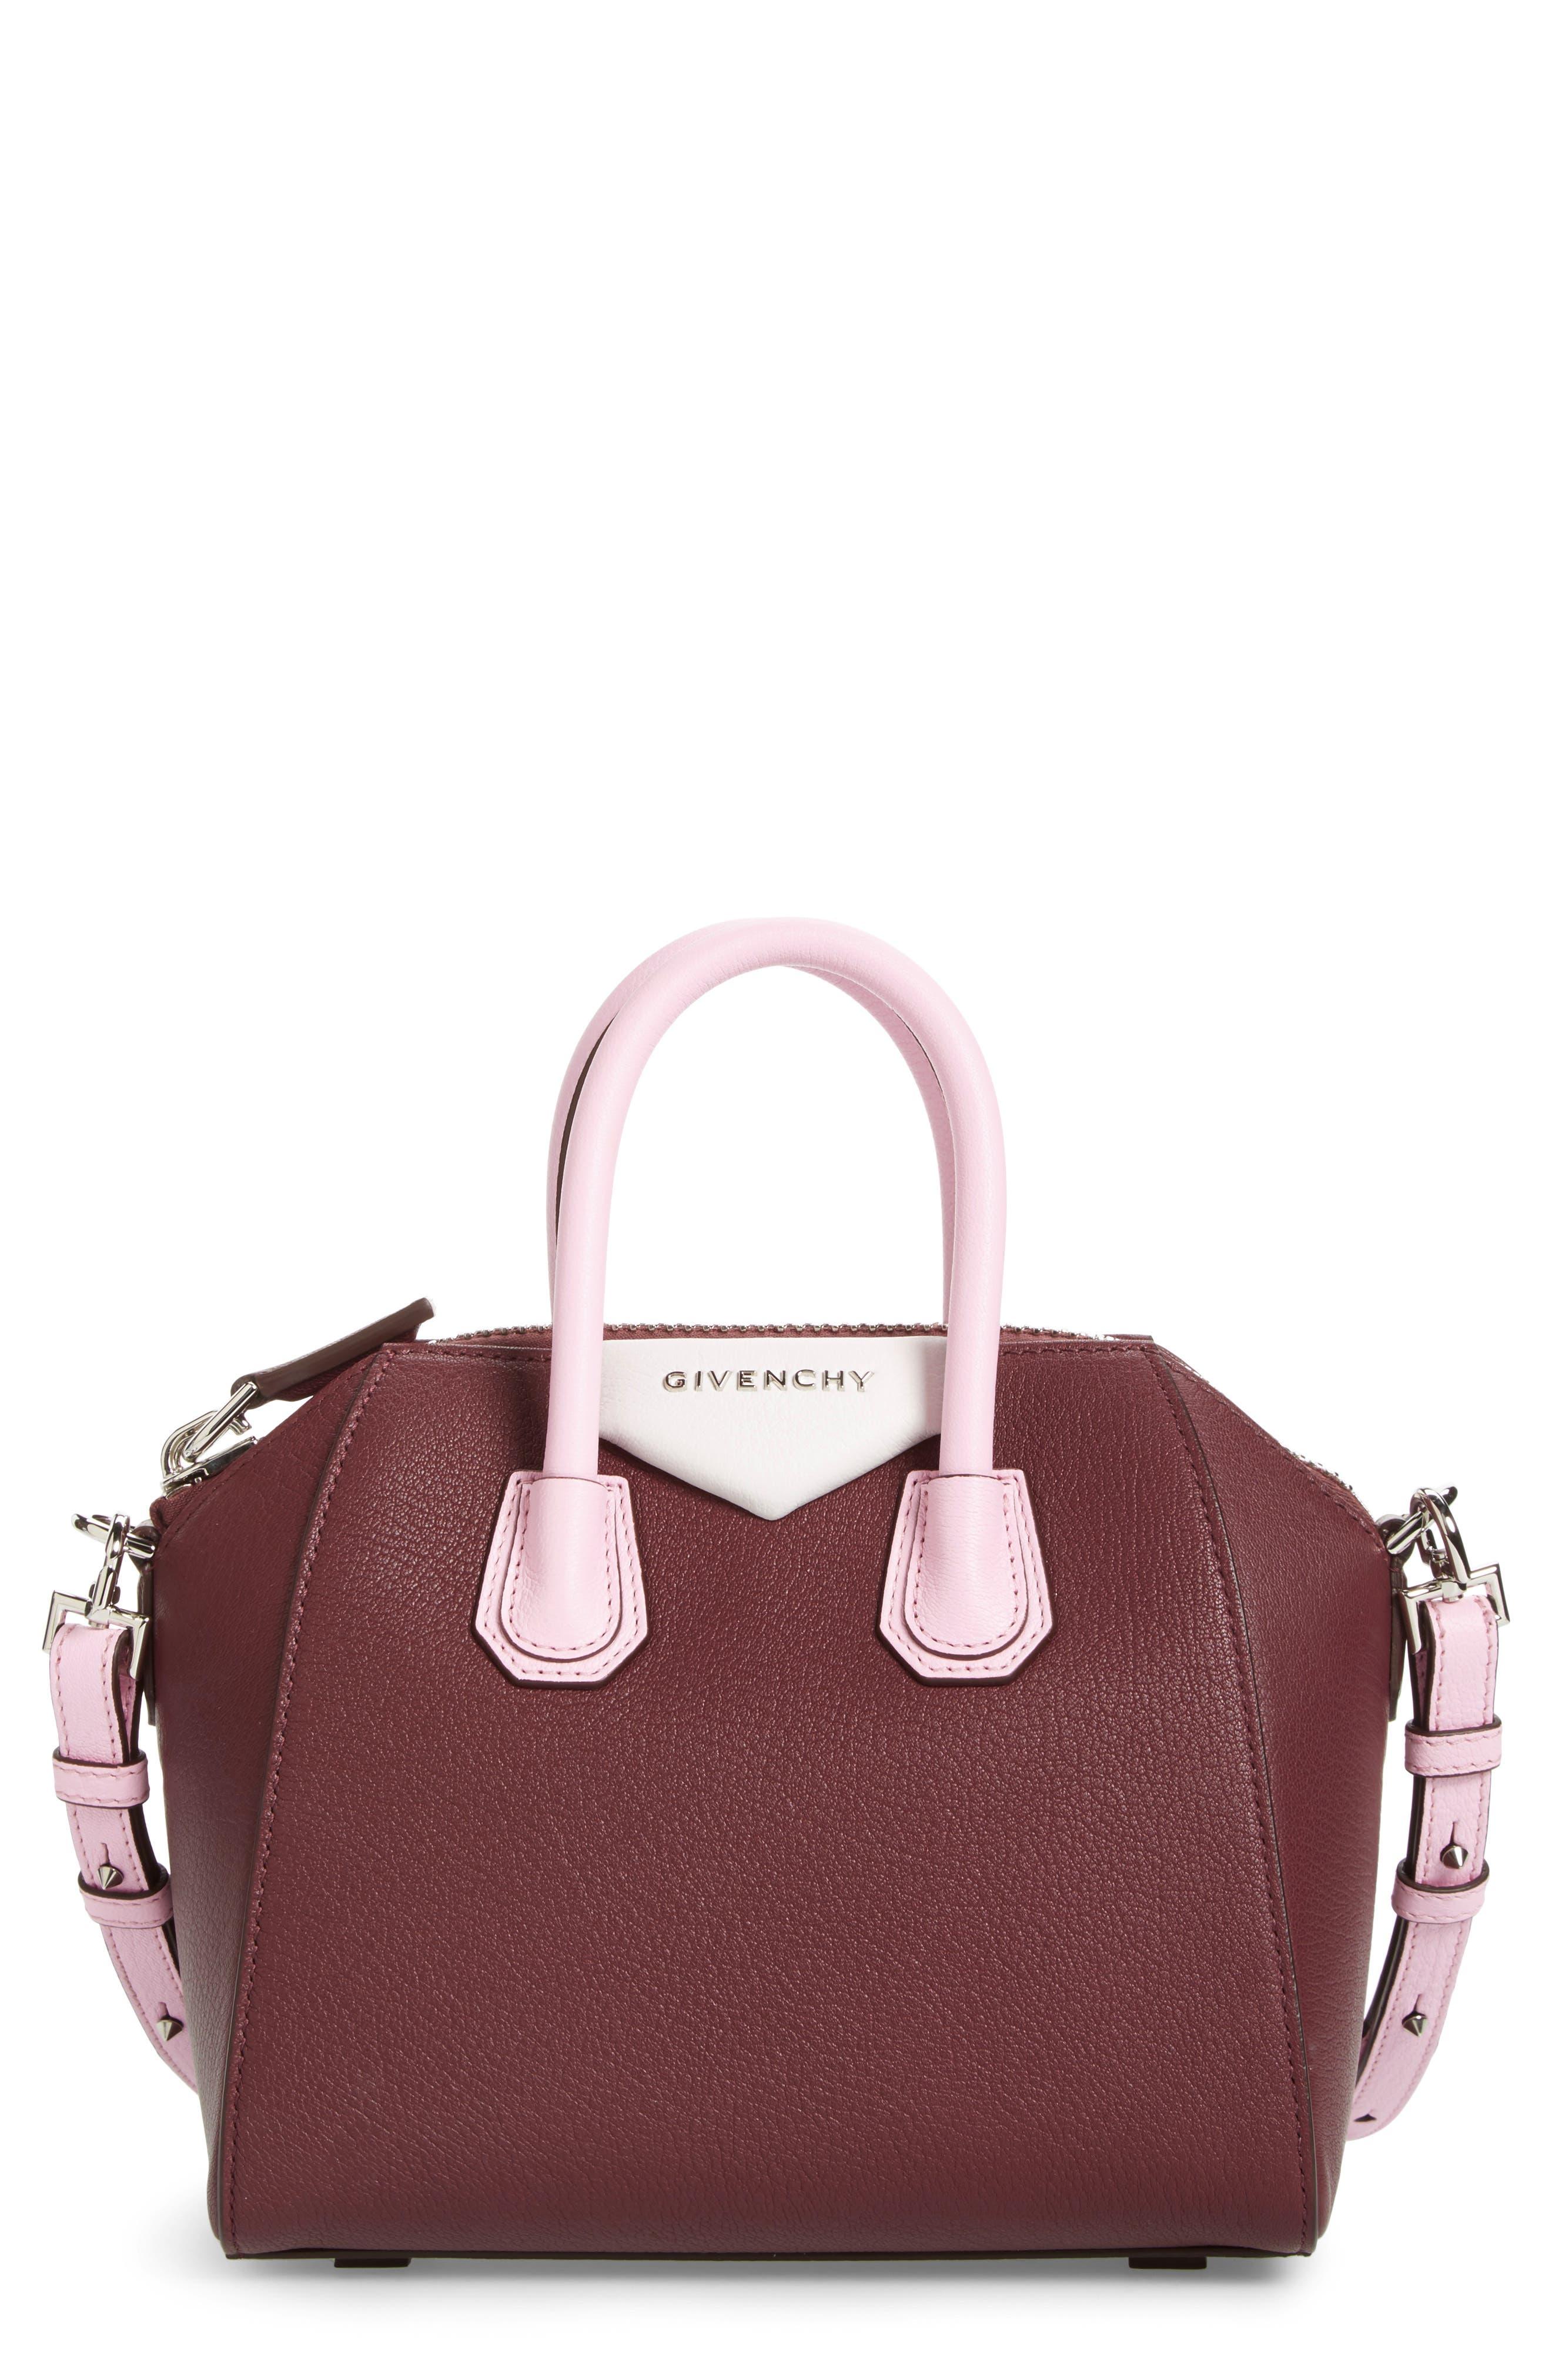 Givenchy Mini Antigona Leather Top Handle Satchel